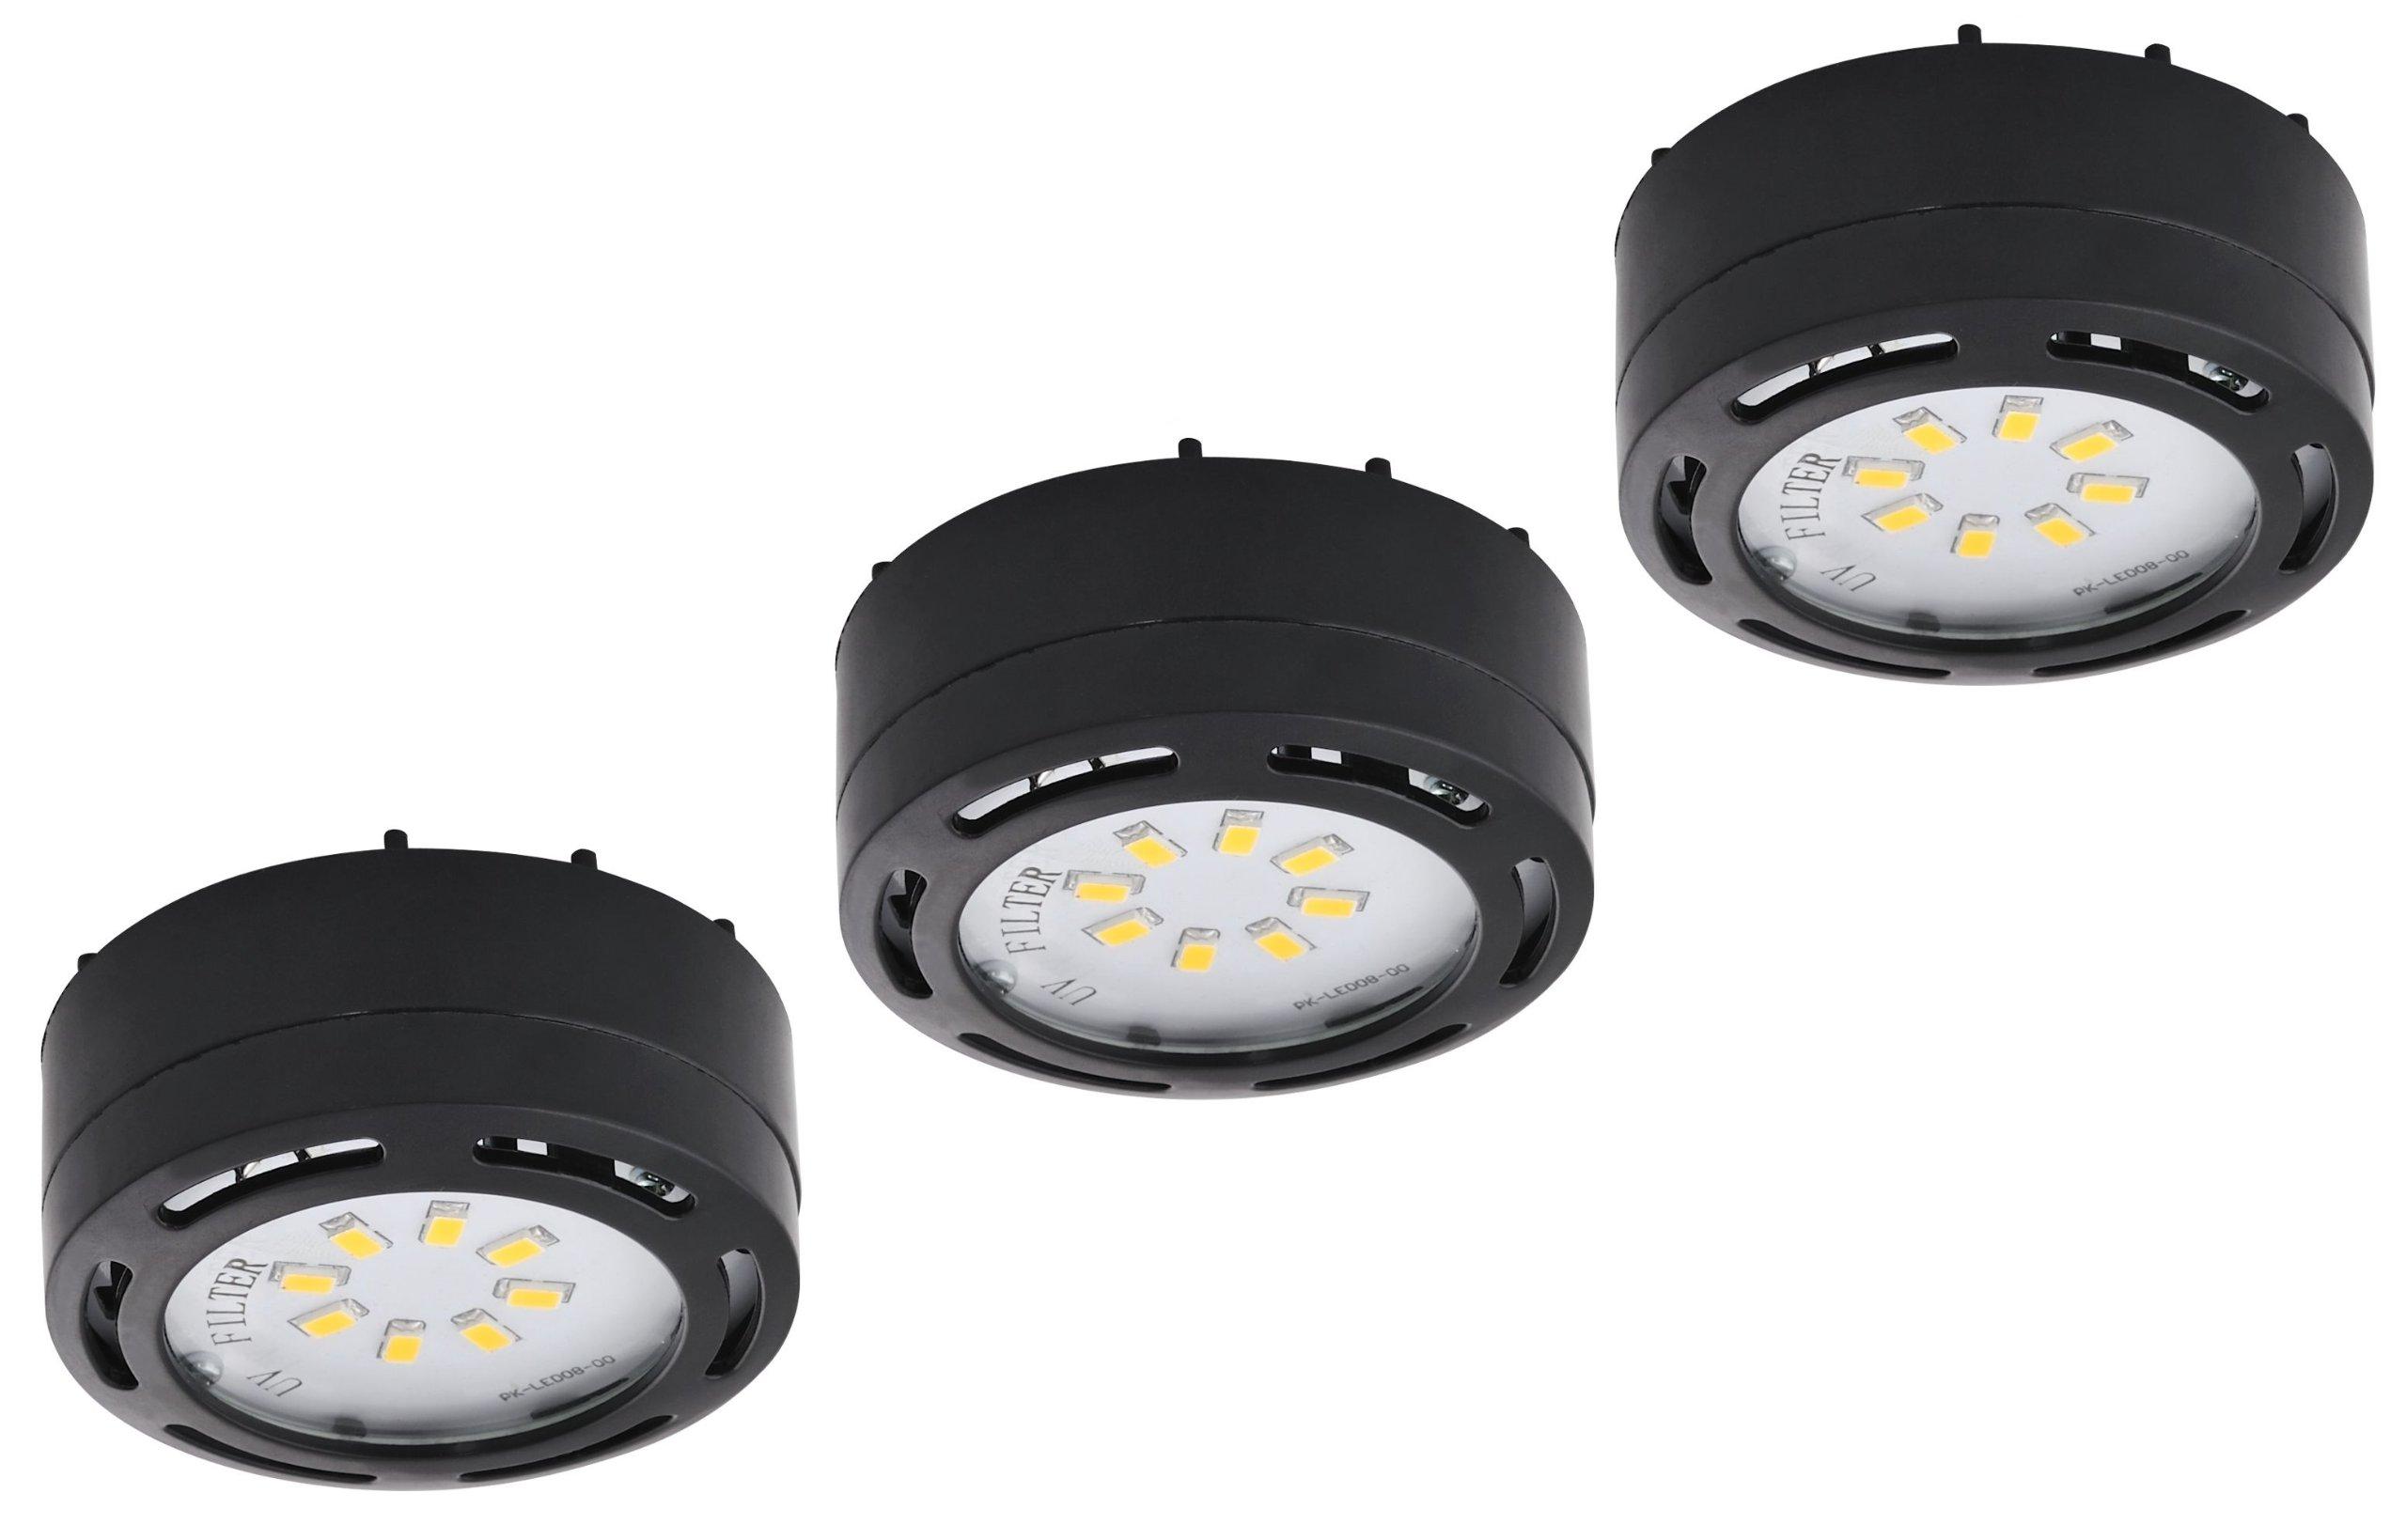 LEDP3120BK - 120V Direct LED Puck 3 Light Kit-Black